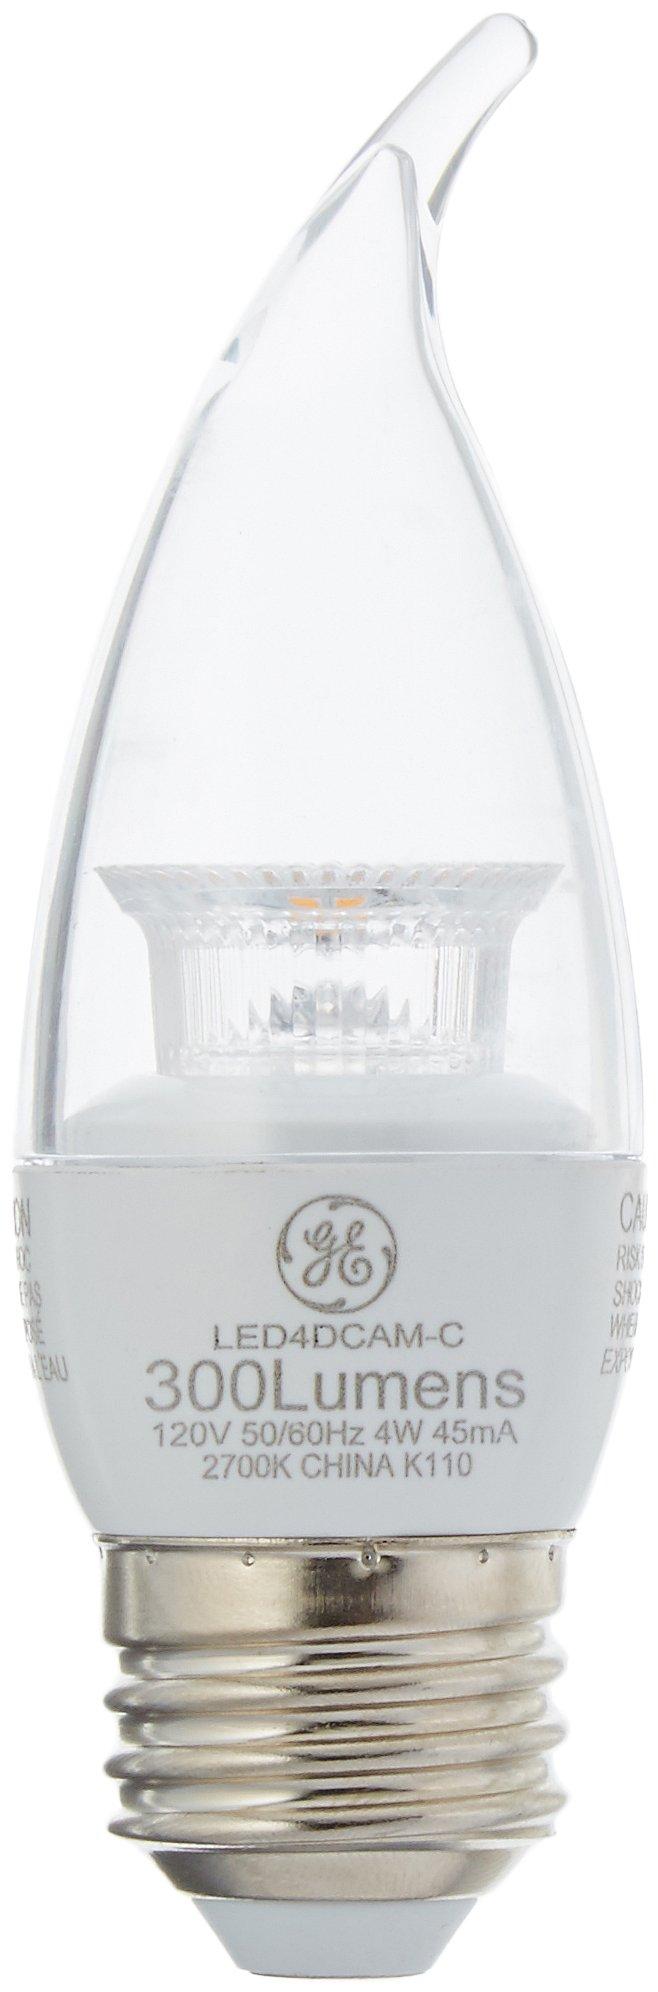 GE LED 40W Equivalent Soft White (2700K) CA11 Bent Tip Medium Base Clear Dimmable LED Light Bulb